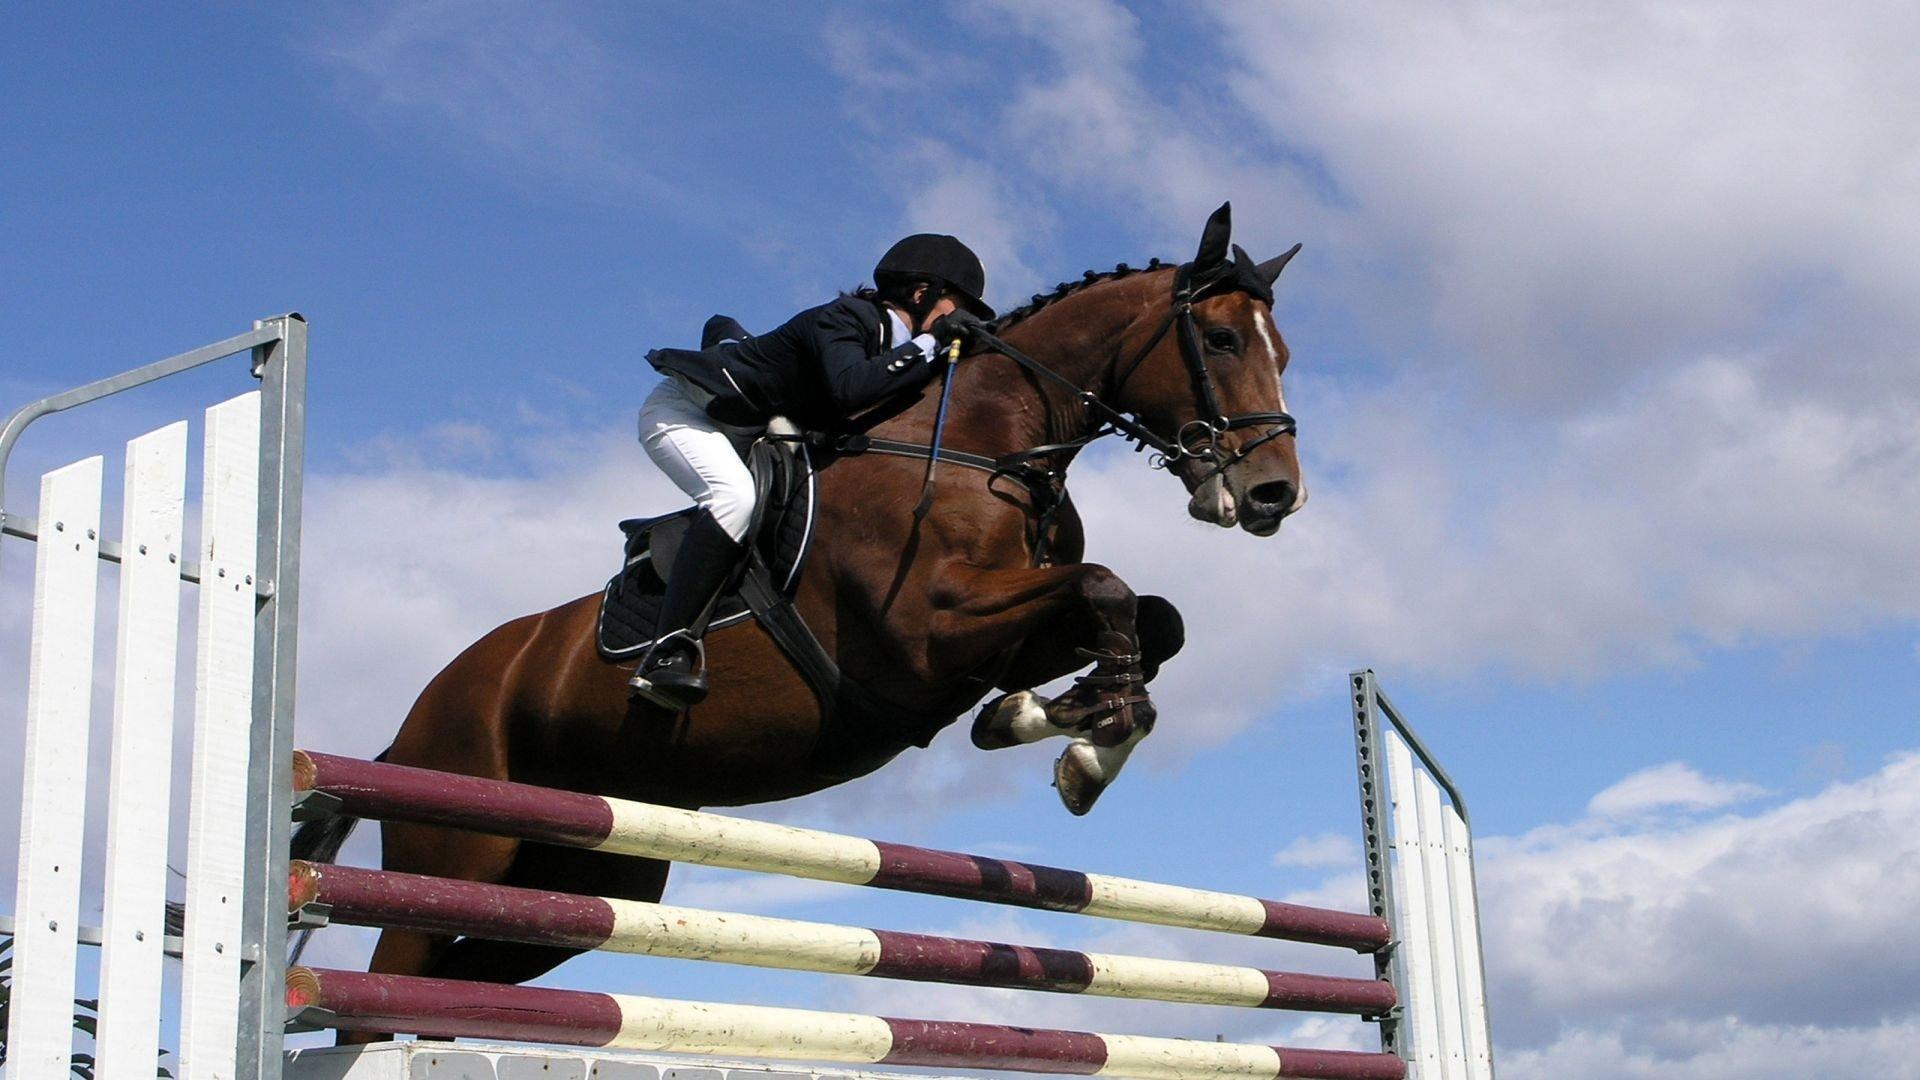 Horseback Riding Wallpaper Show Jumping 2106399 Hd Wallpaper Backgrounds Download